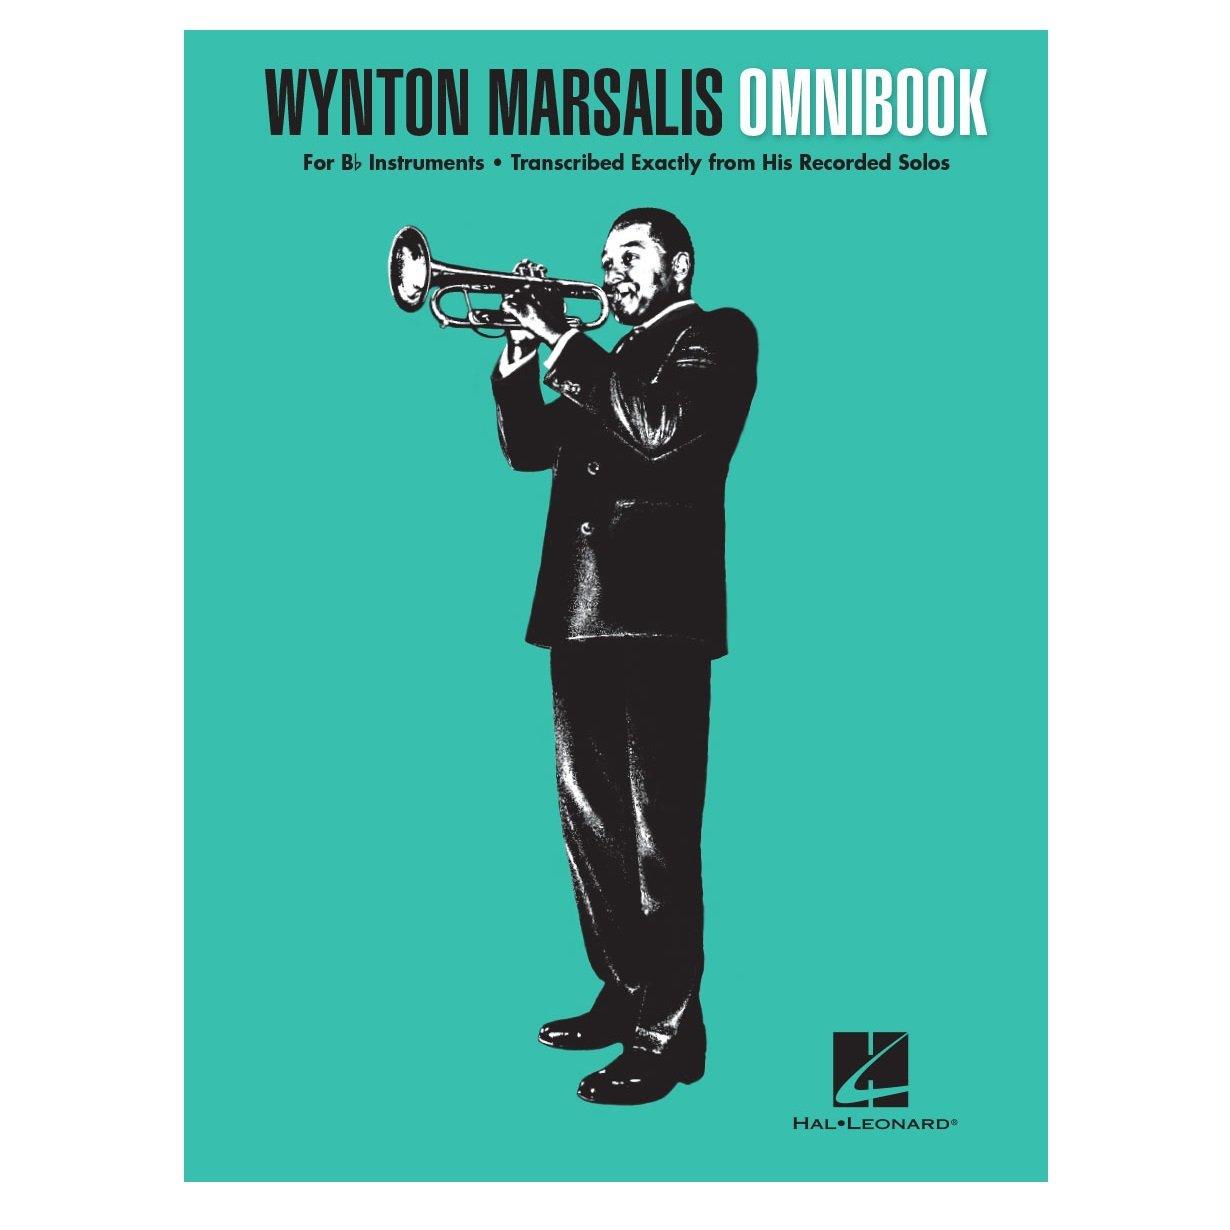 Wynton Marsalis Omnibook for Bb Instruments